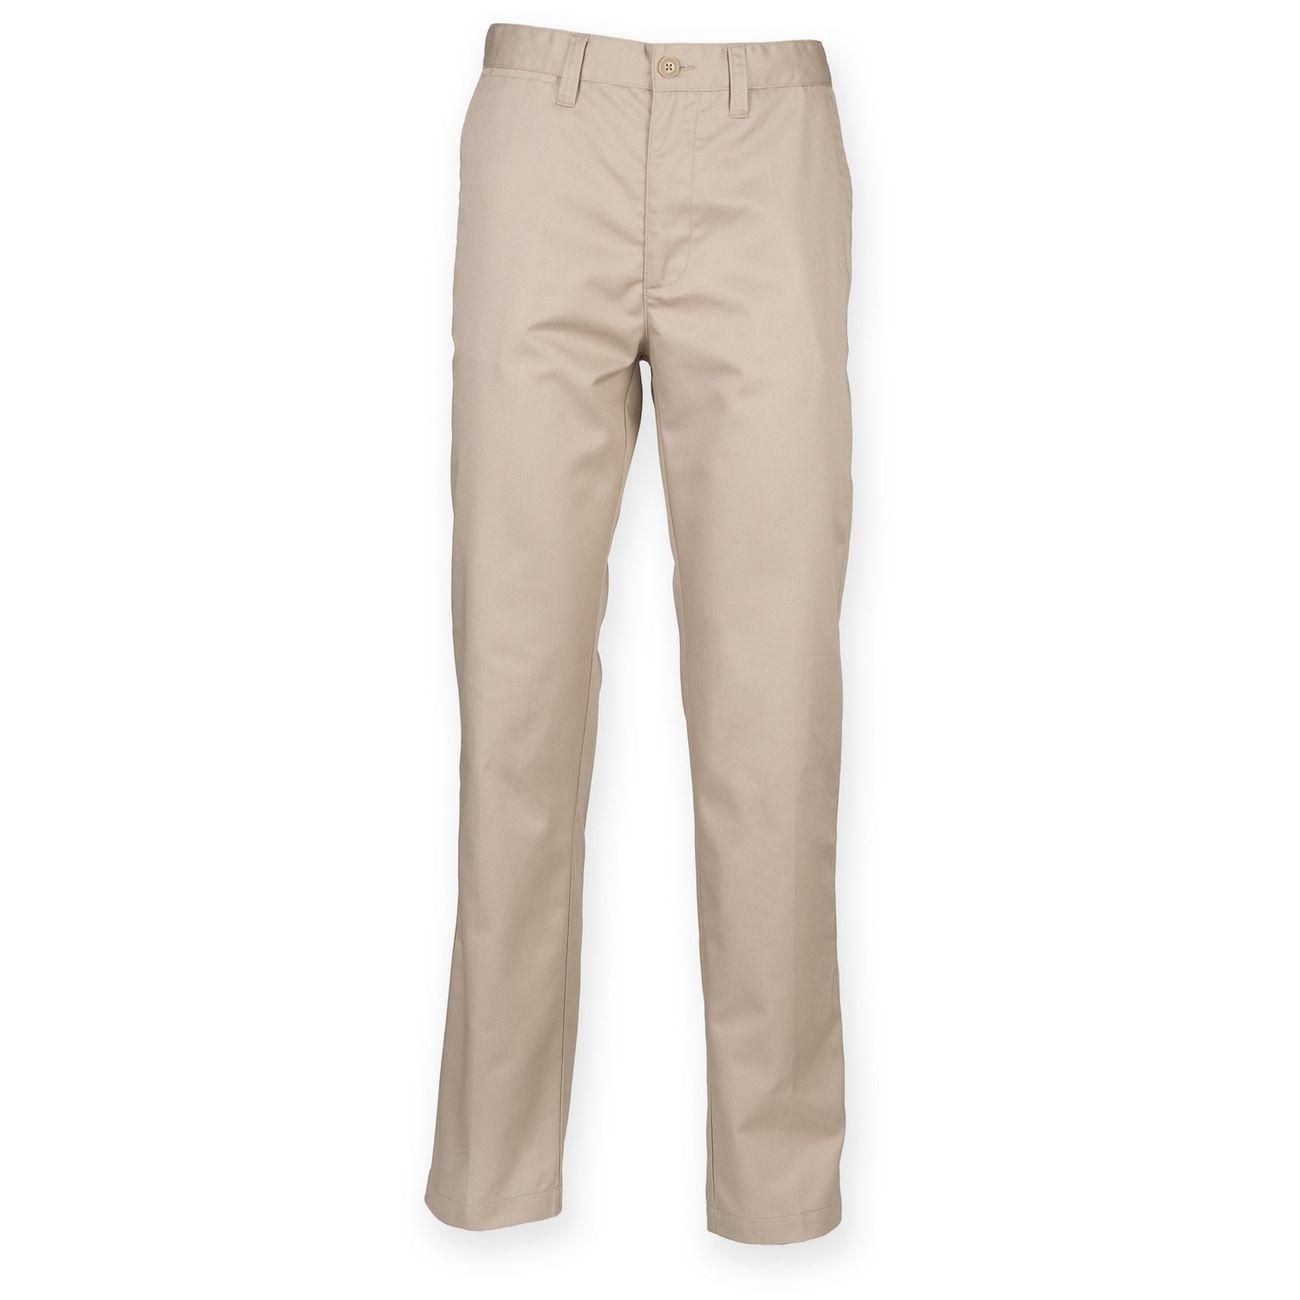 ... Mode- Lifestyle homme HENBURY Henbury - Pantalon chino - Homme ... 78caf28f1160